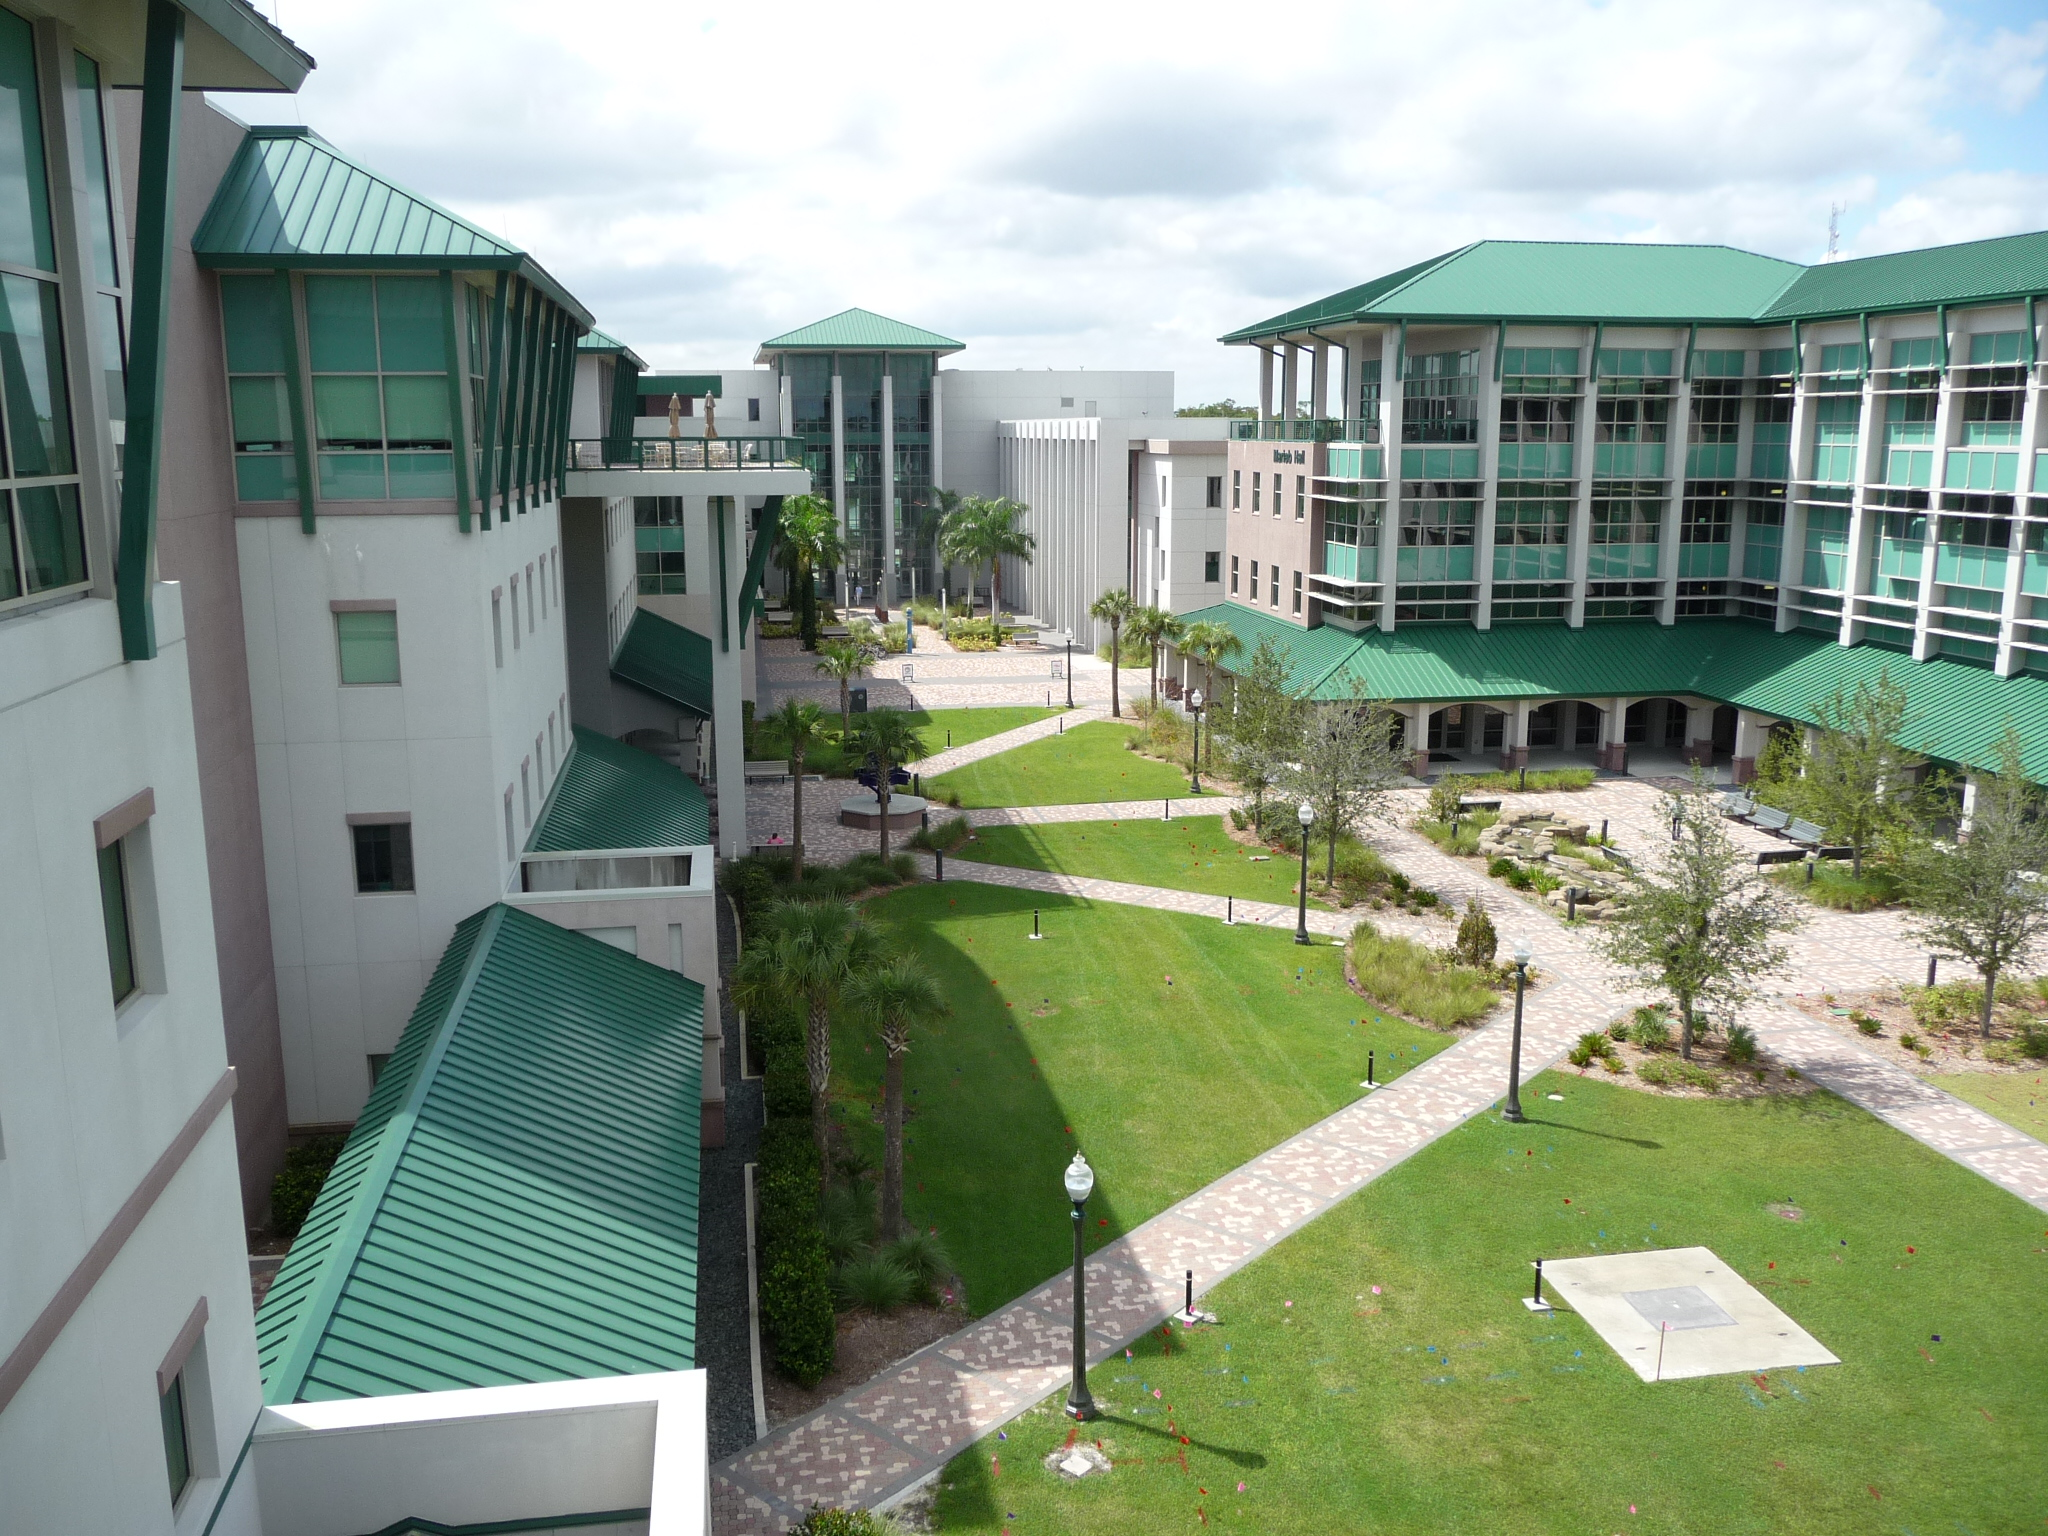 Physical Therapy Schools - Florida Gulf Coast University